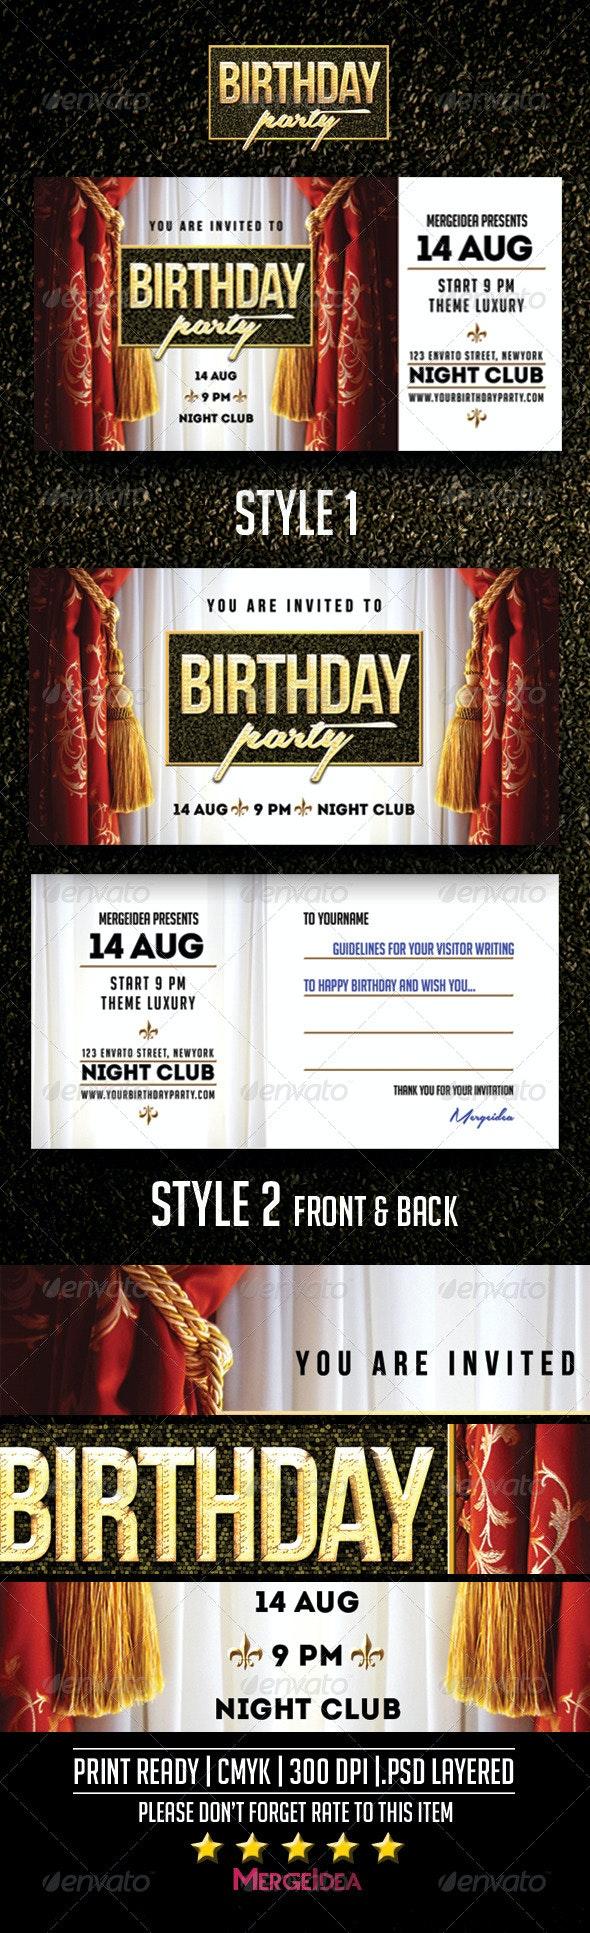 Birthday Party Invitation - Invitations Cards & Invites